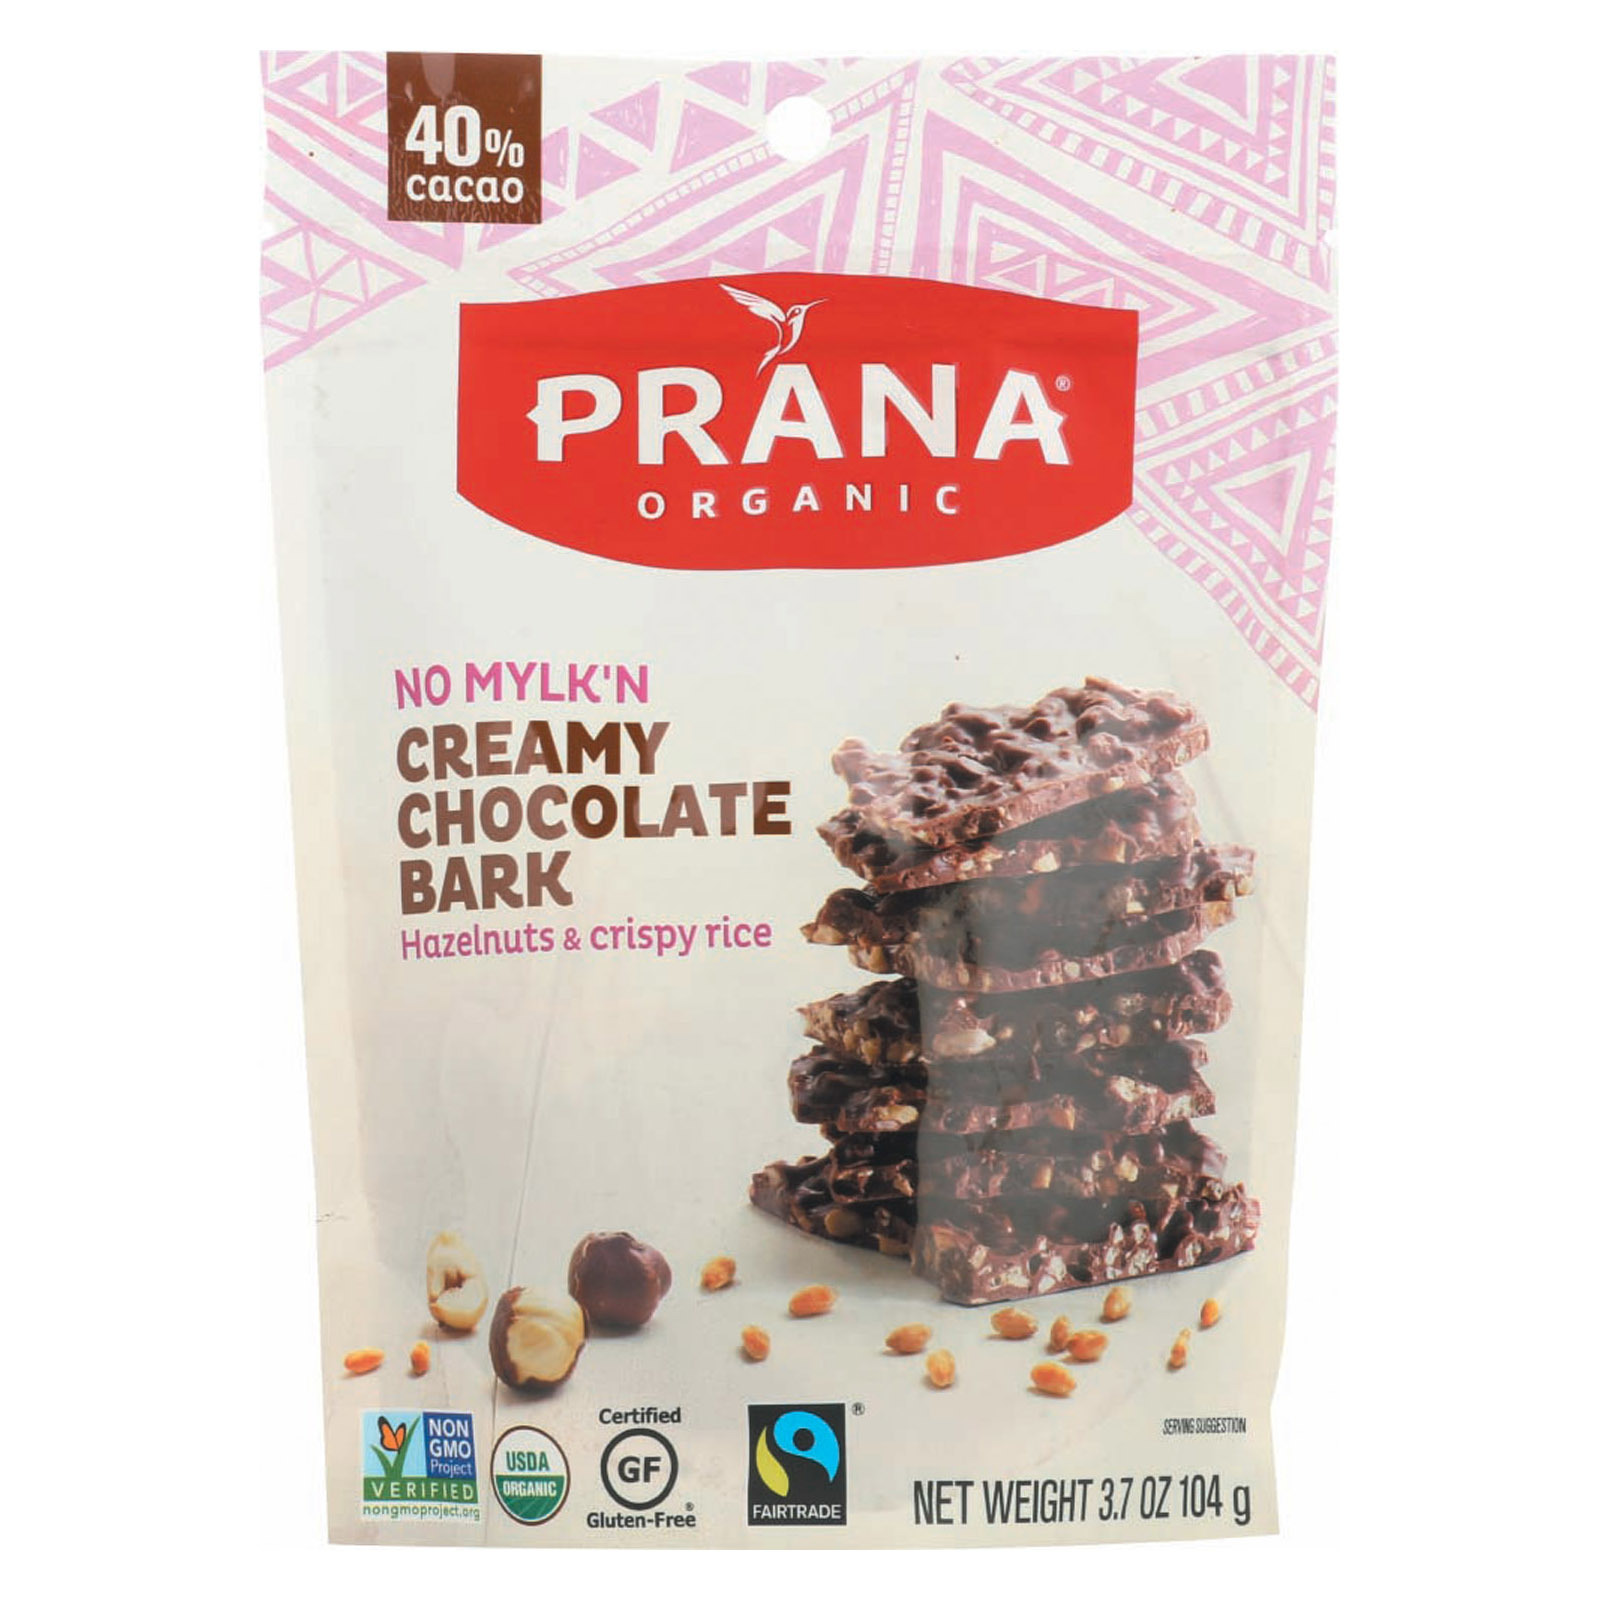 Prana Organics Organic 40% Chocolaty Bark - Hazelnuts and Crispy Rice - Case of 8 - 4 oz